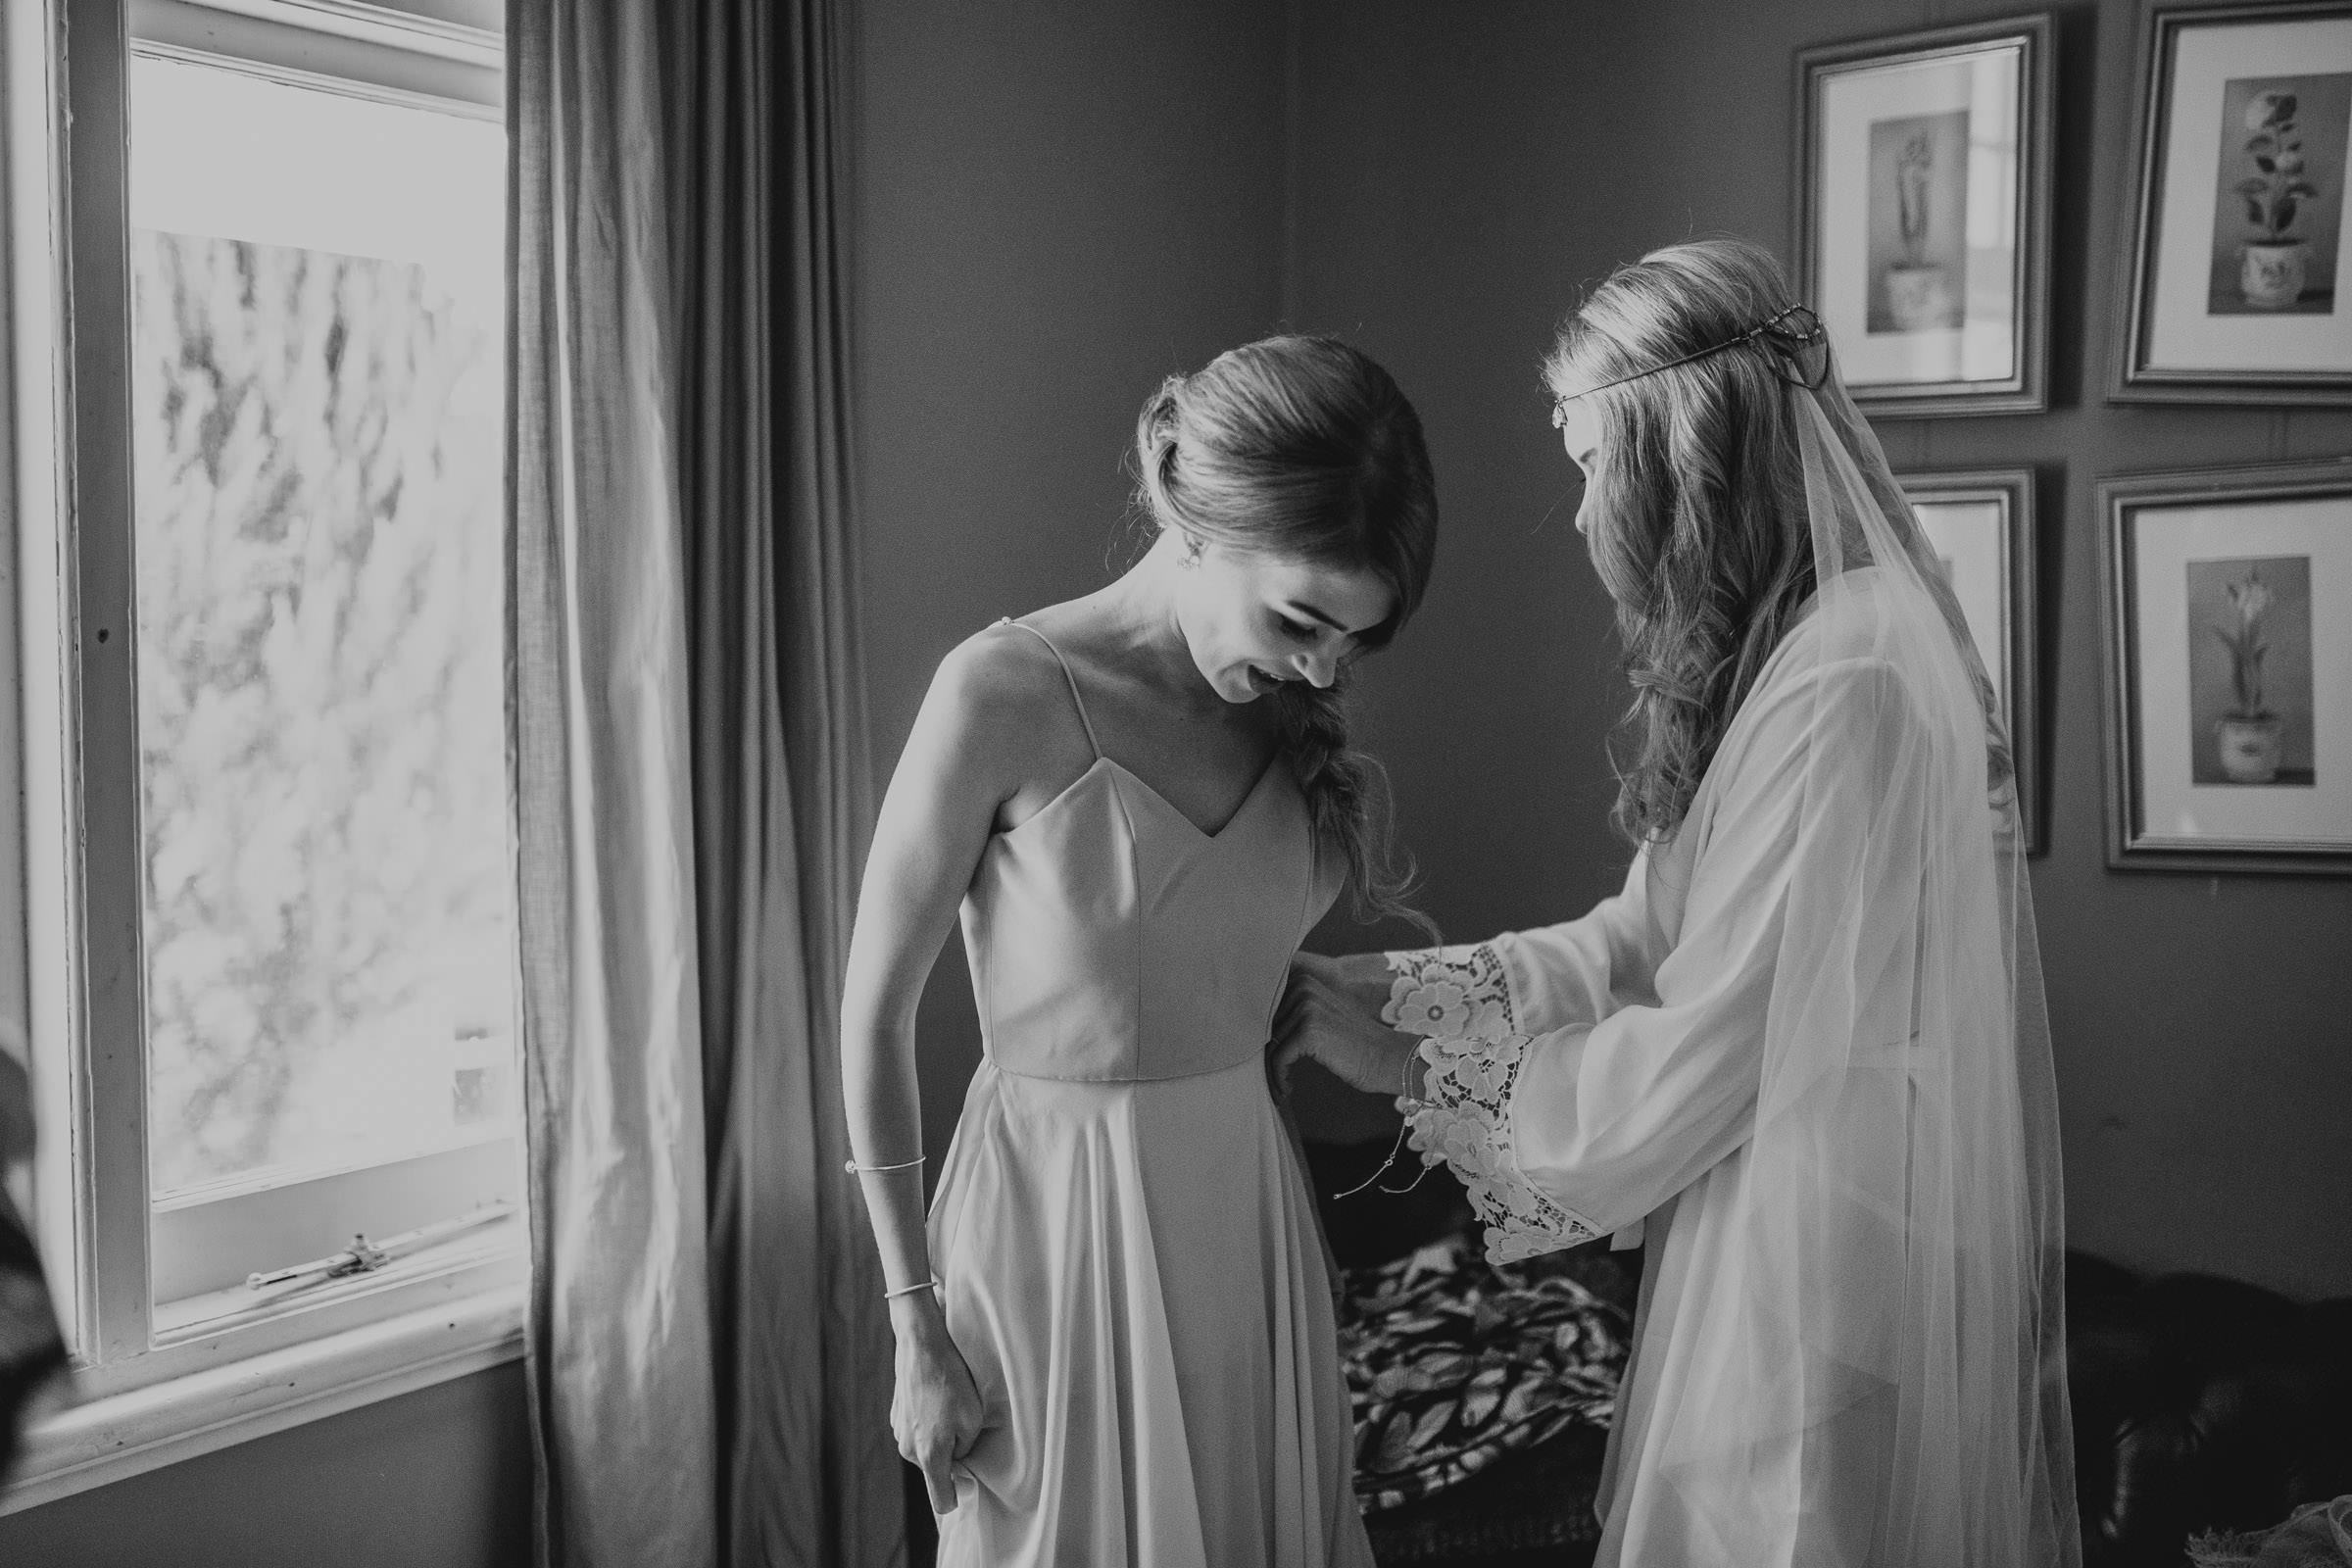 Emma+John+Far+South+Coast+Wedding+Festivl+Glamping+Bush-41.jpg